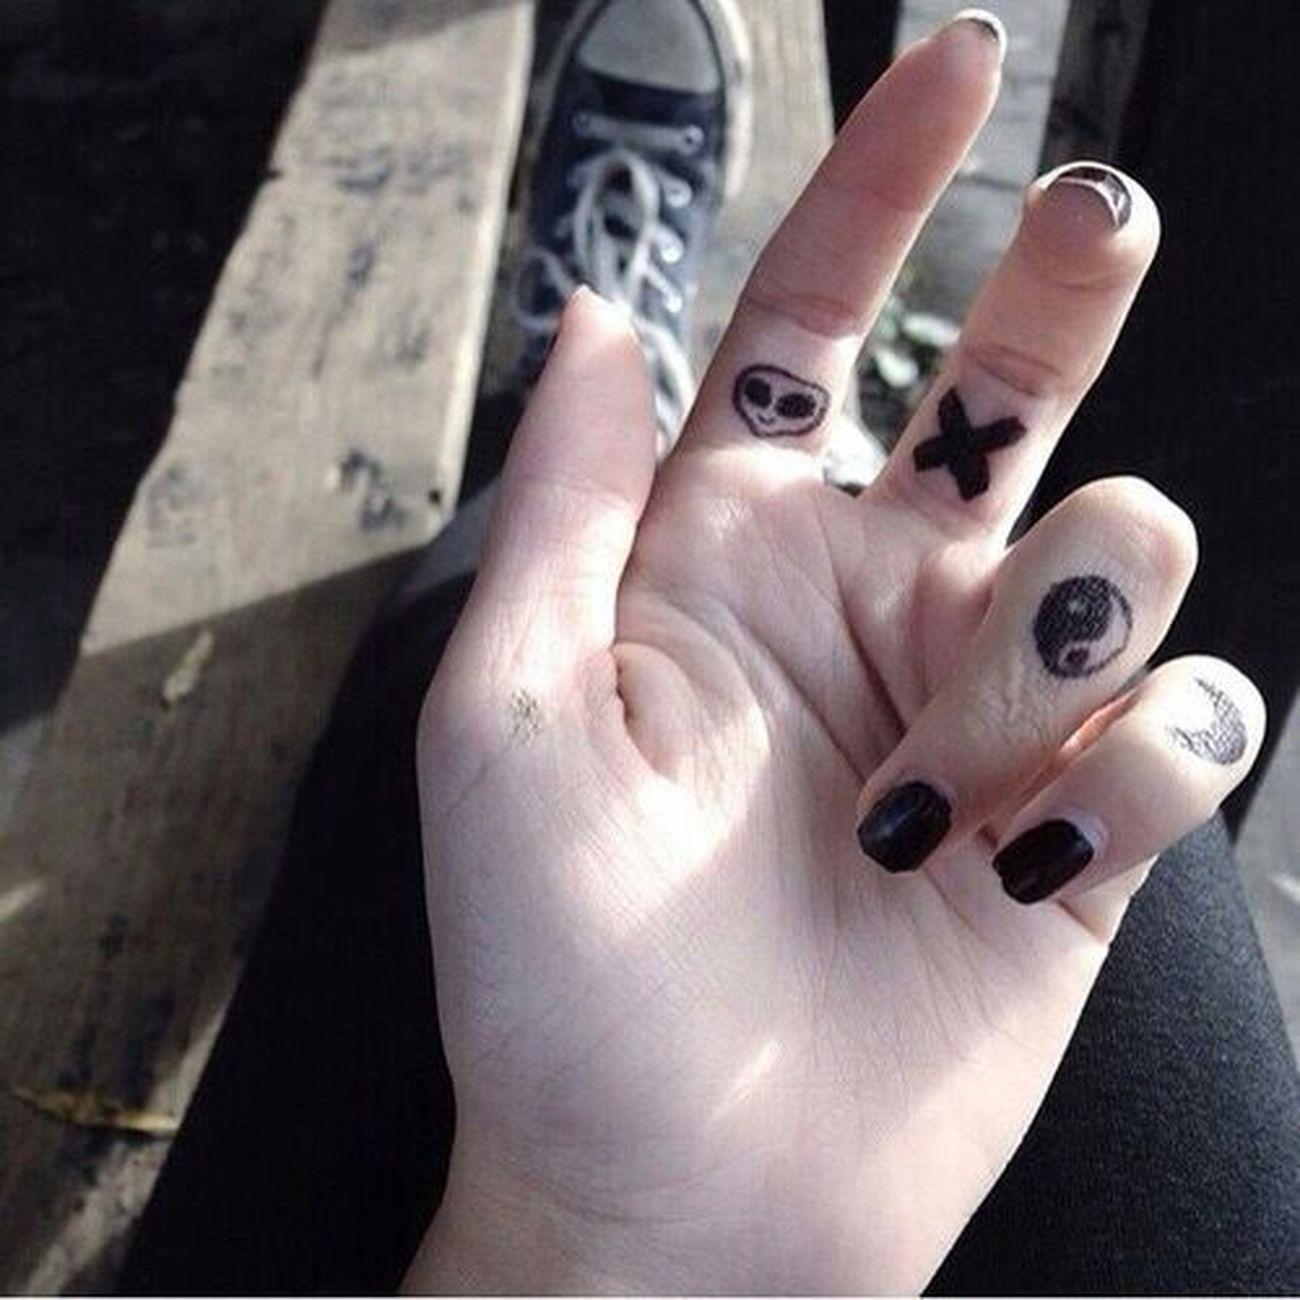 Hand Alian Moon Fingers Black Girl Follow Comment